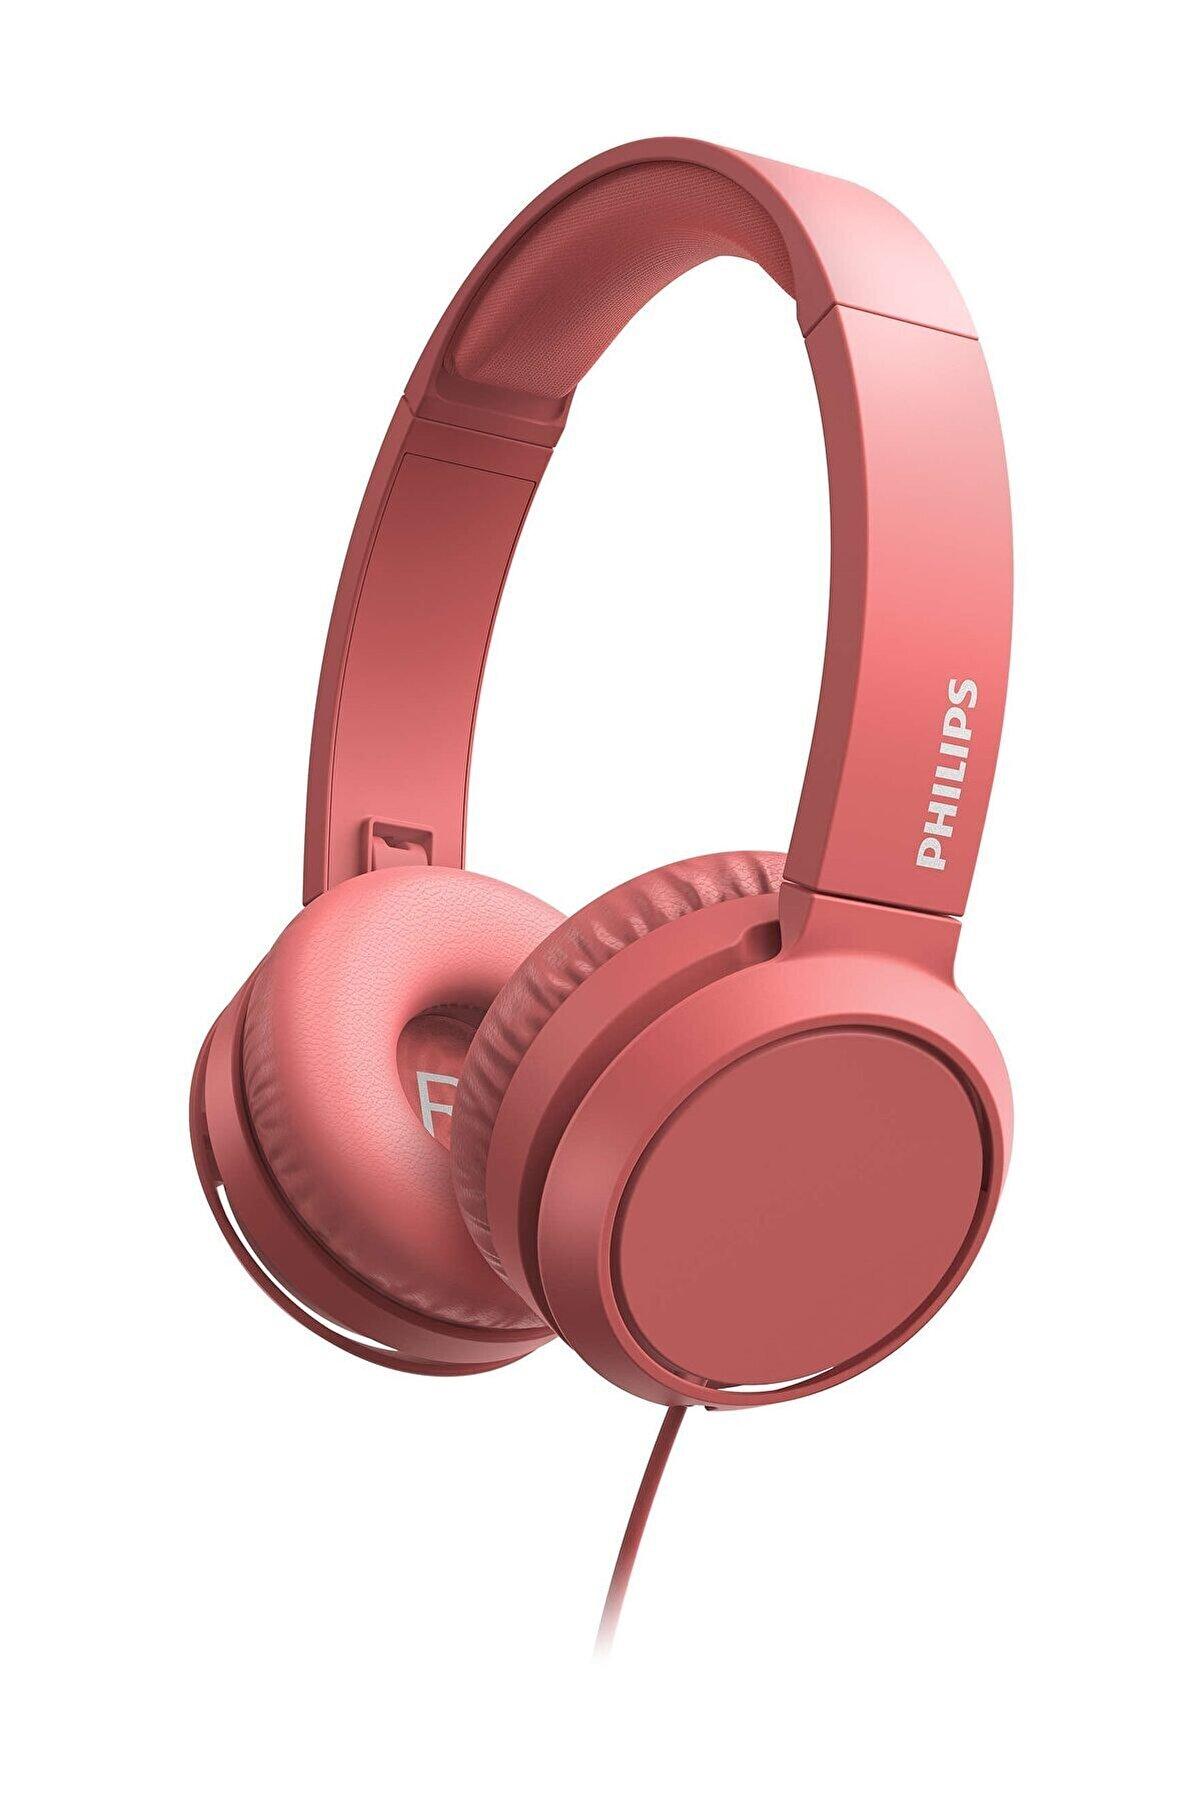 Philips TAH4105 Pembe Kablolu Kulak Üstü Kulaklık